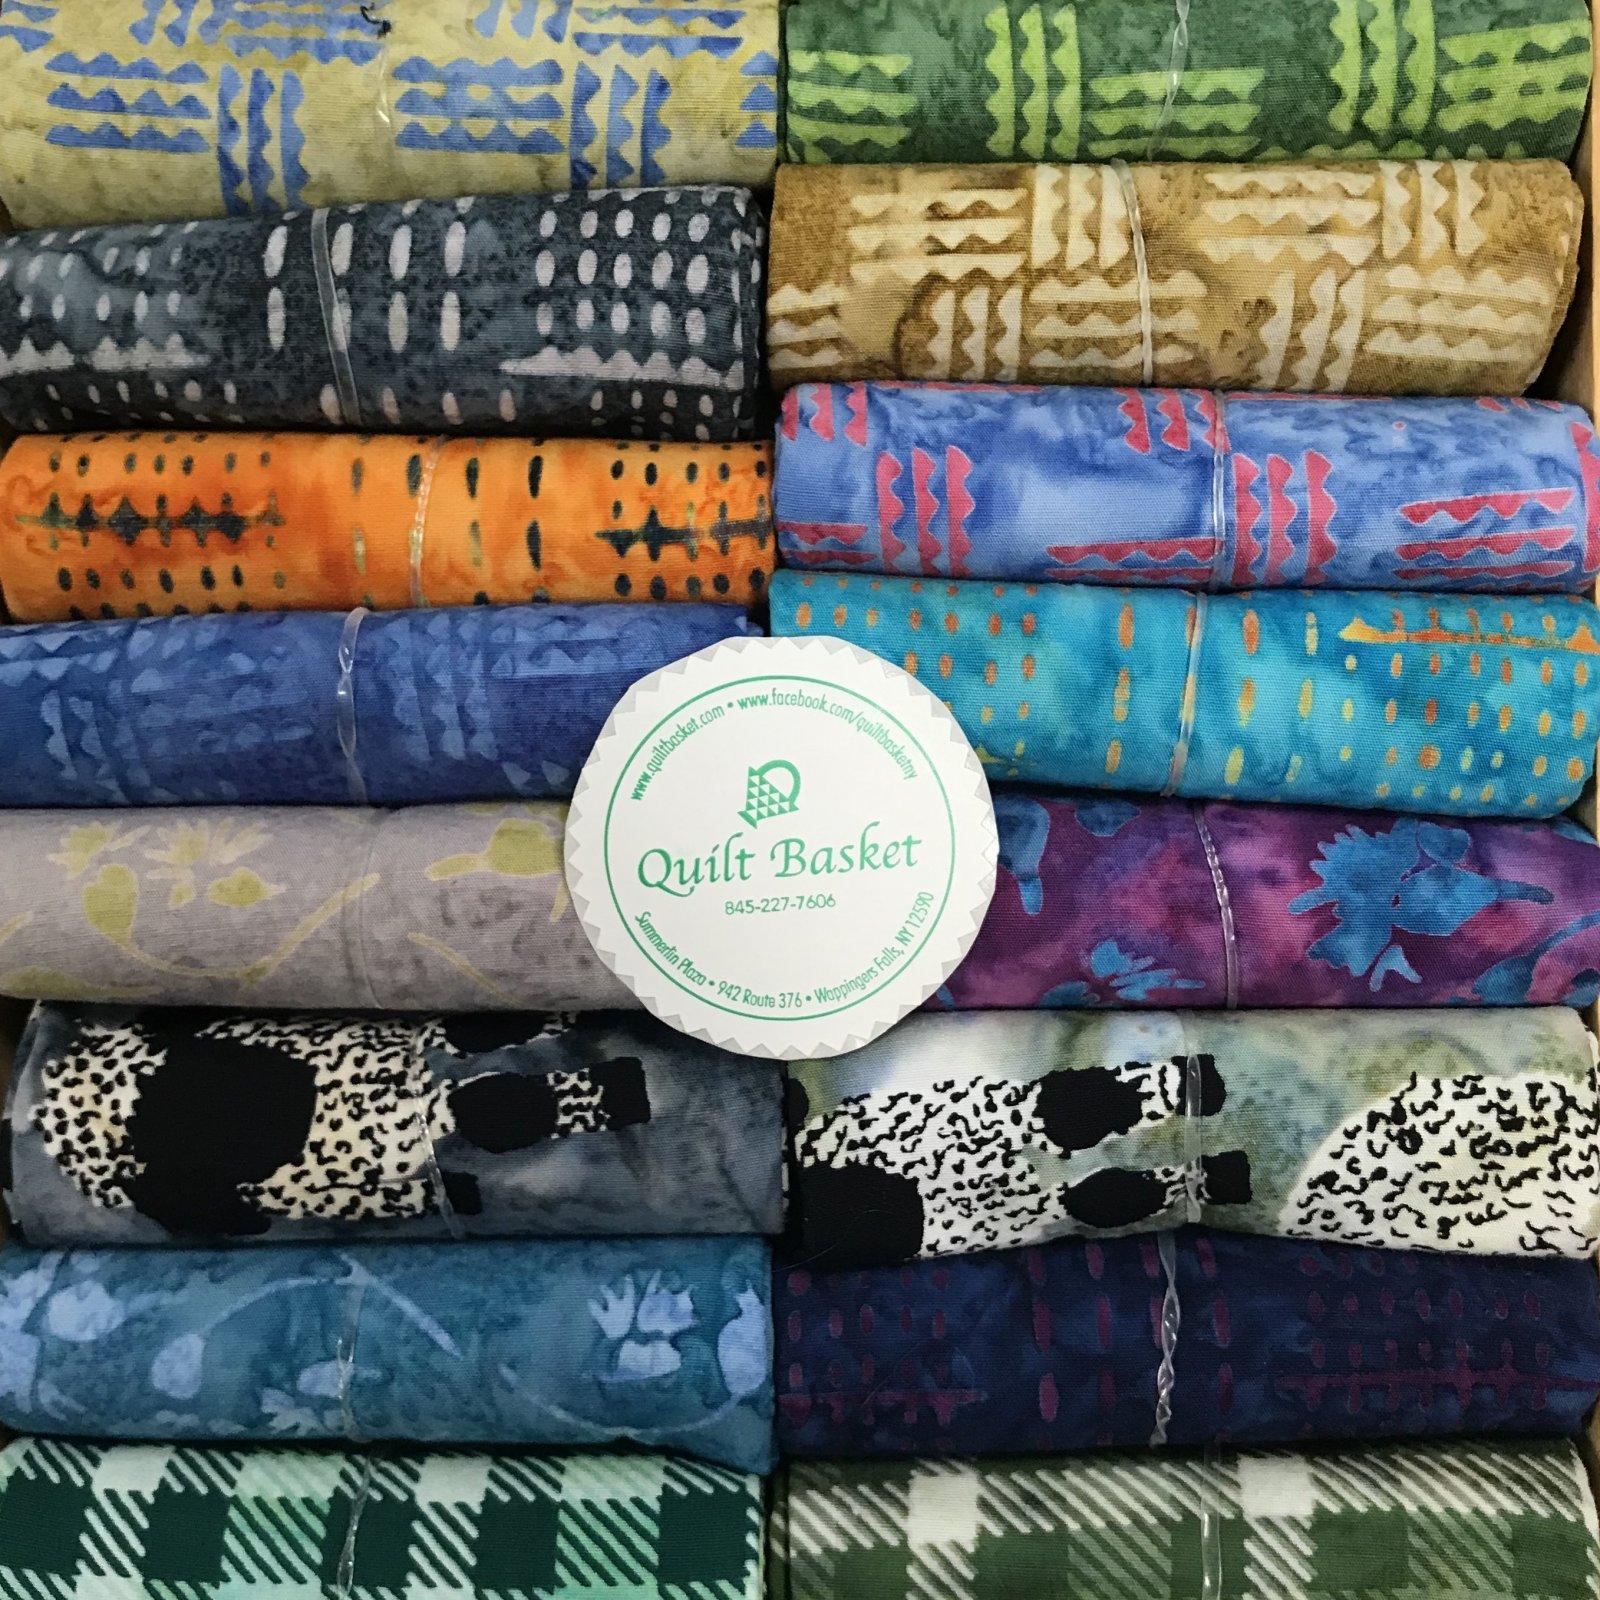 Cutie Collection Northcott Banyan Batiks Kilts & Quilts QBCC-0192